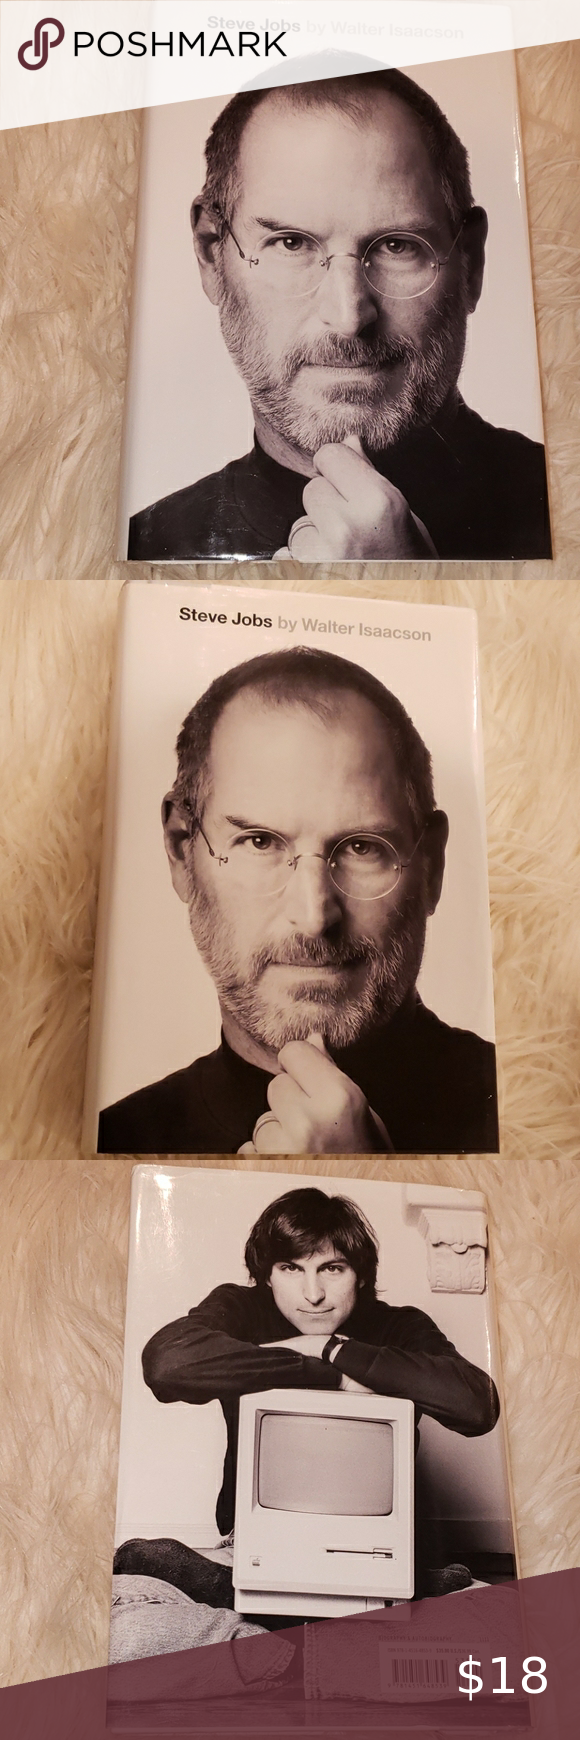 Hardback Book Steve Jobs By Walter Isaacson Steve Jobs Steve Job